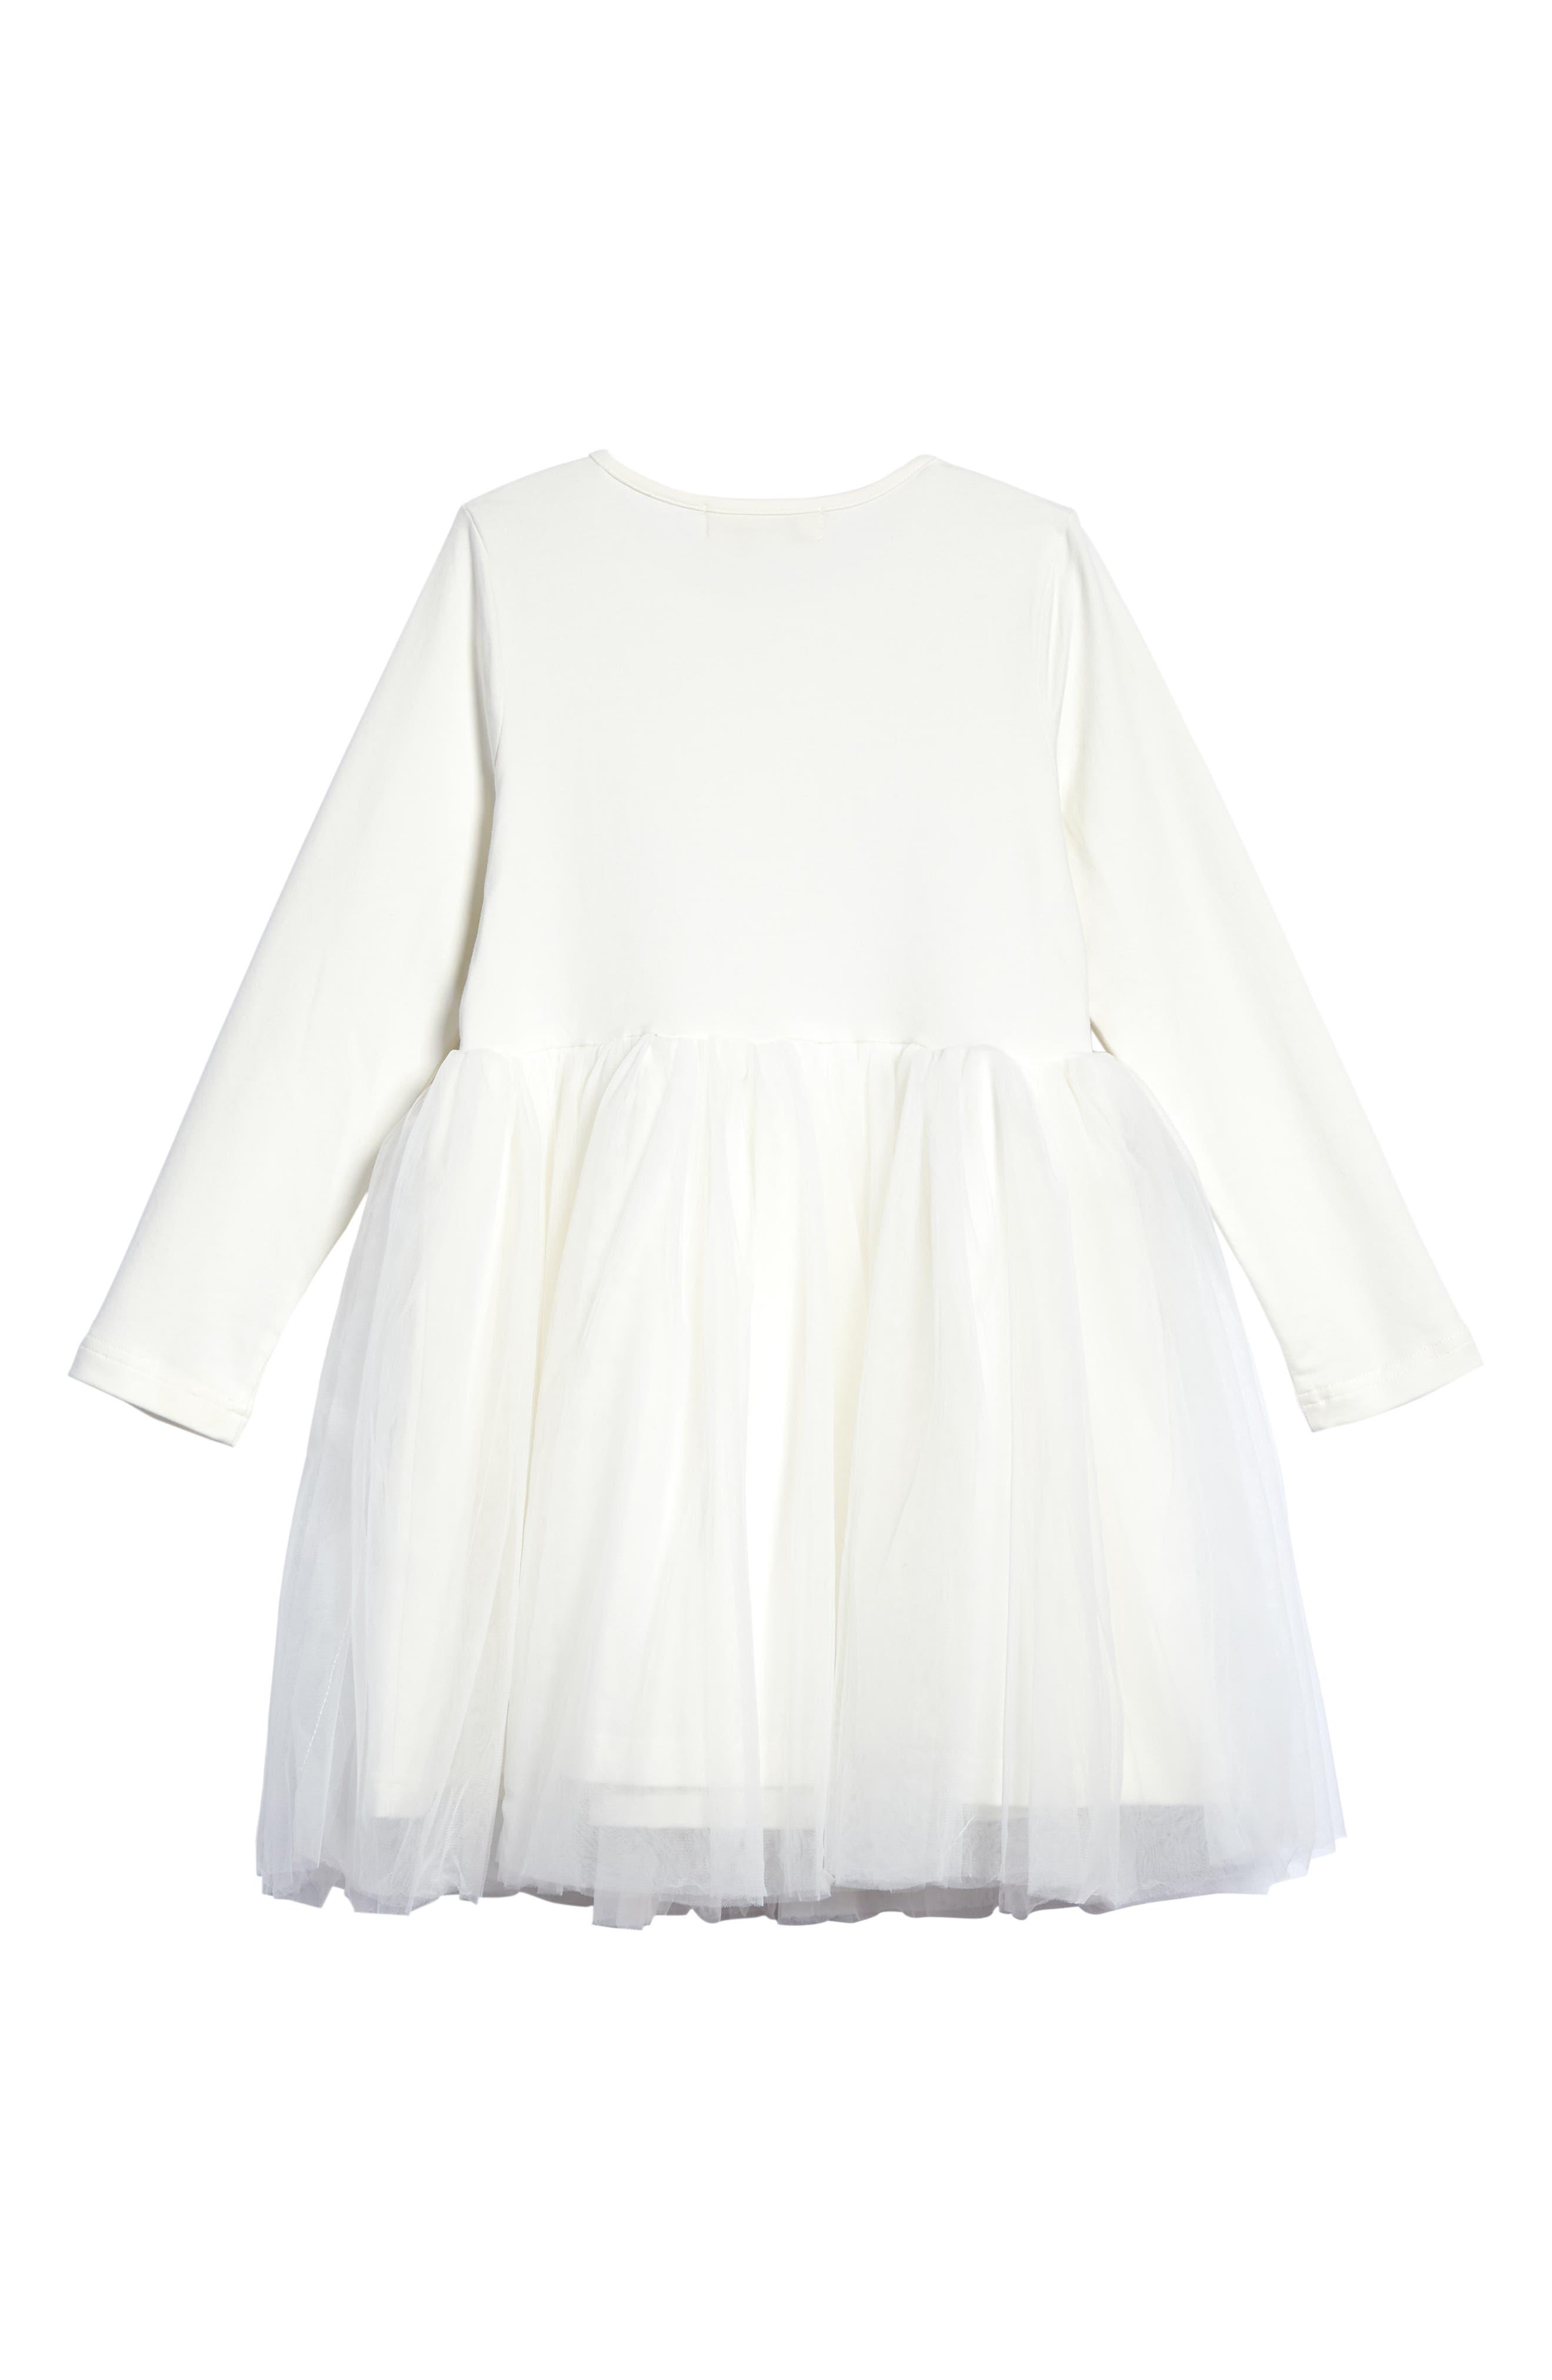 Alternate Image 2  - Doe A Dear Tulle Party Dress (Toddler Girls & Little Girls)